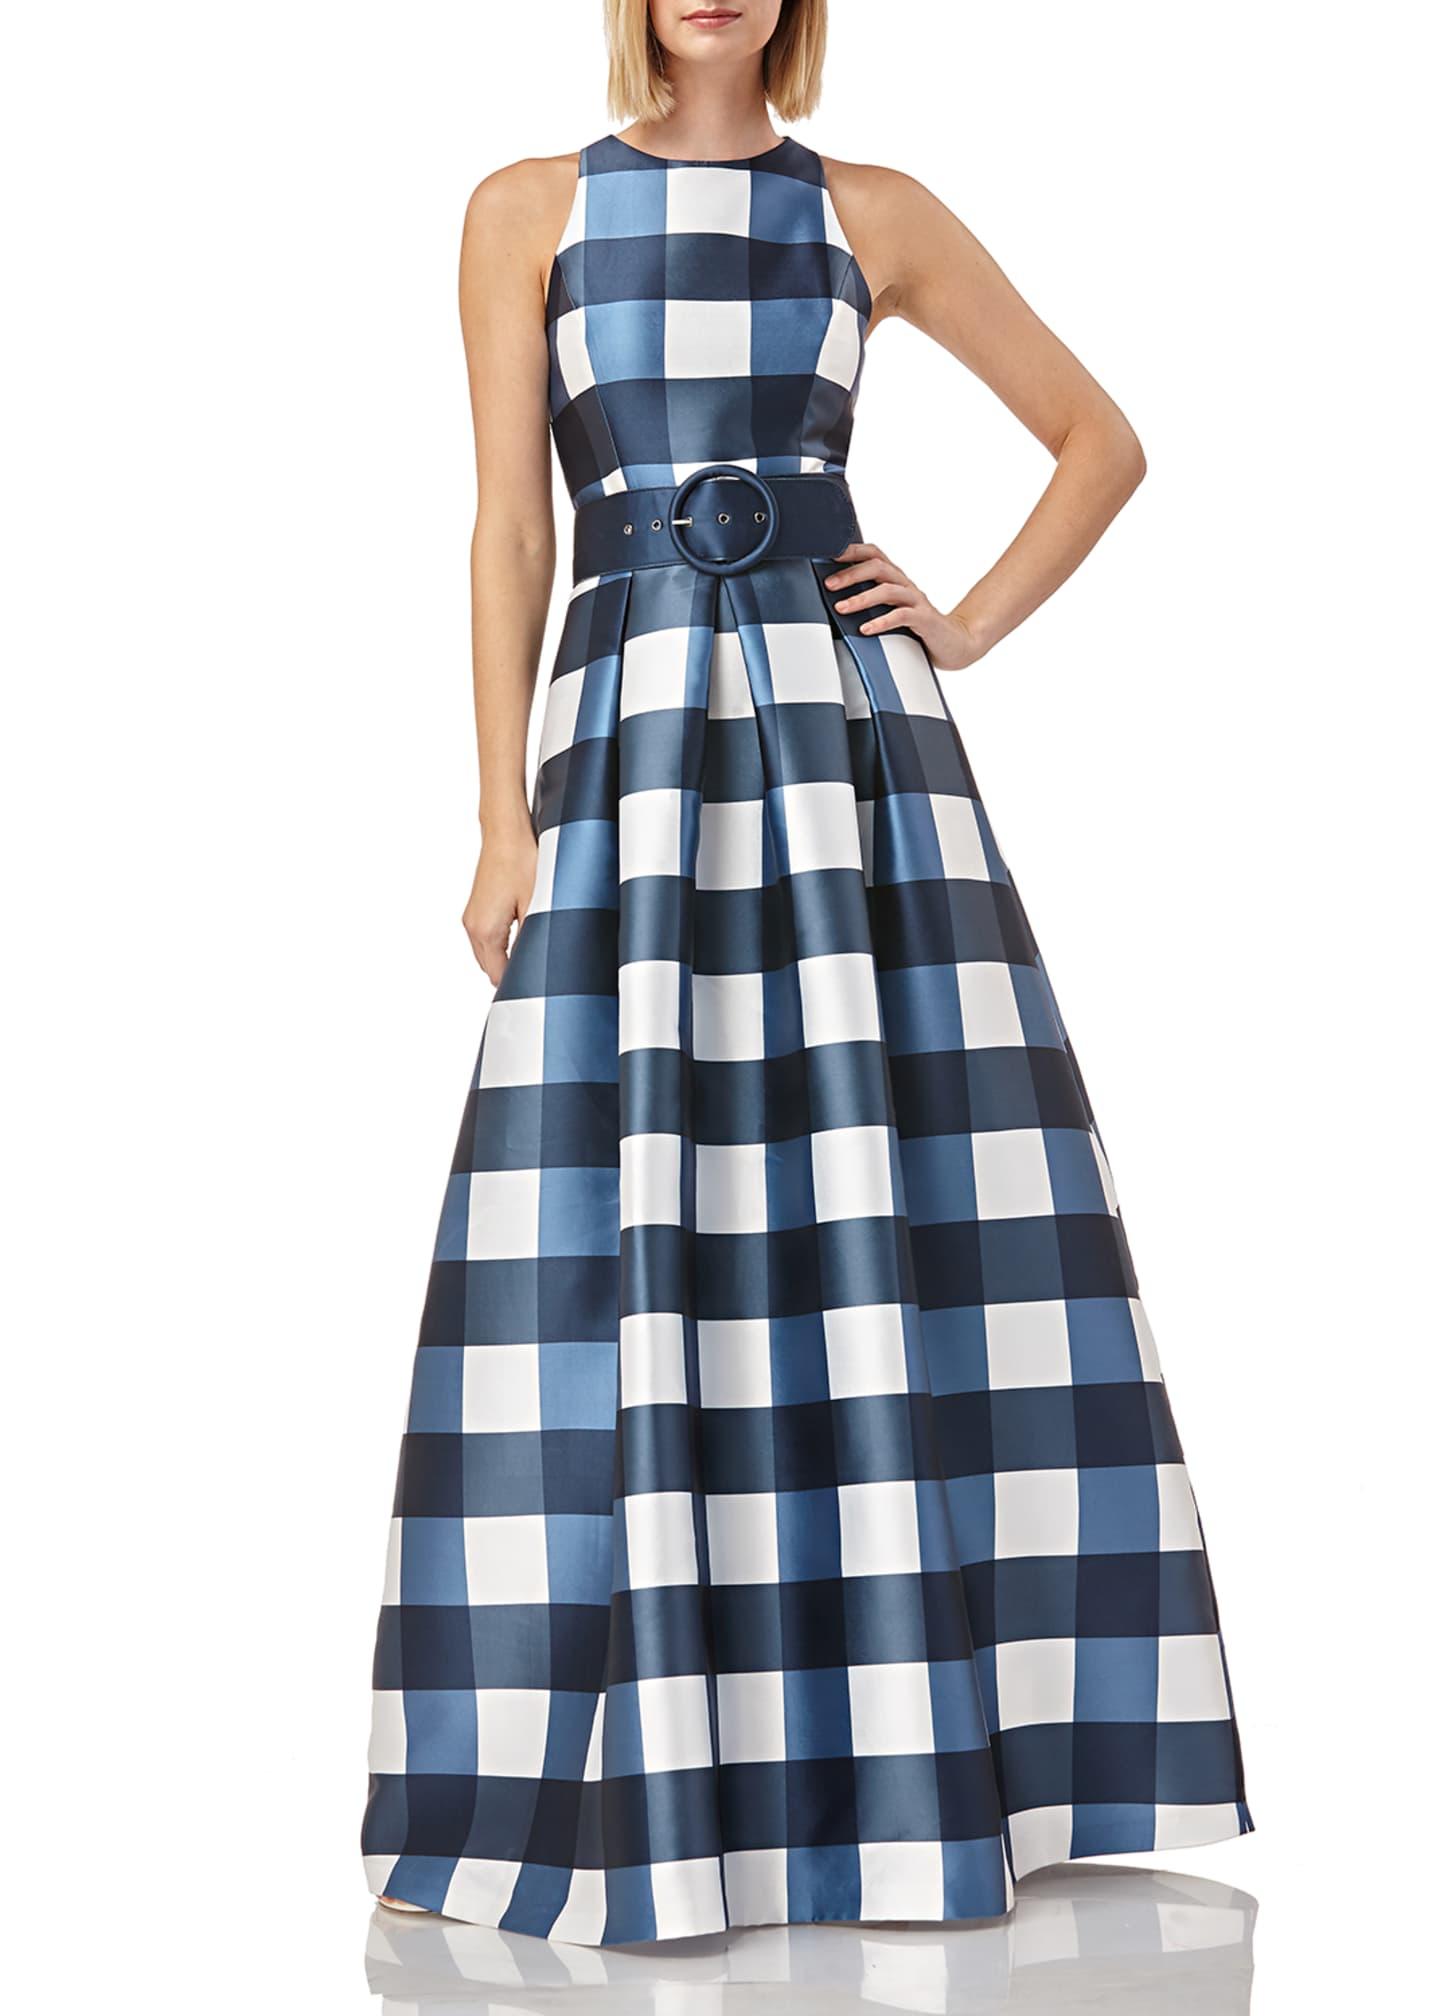 Kay Unger New York Gingham-Printed Sleeveless Mikado Gown